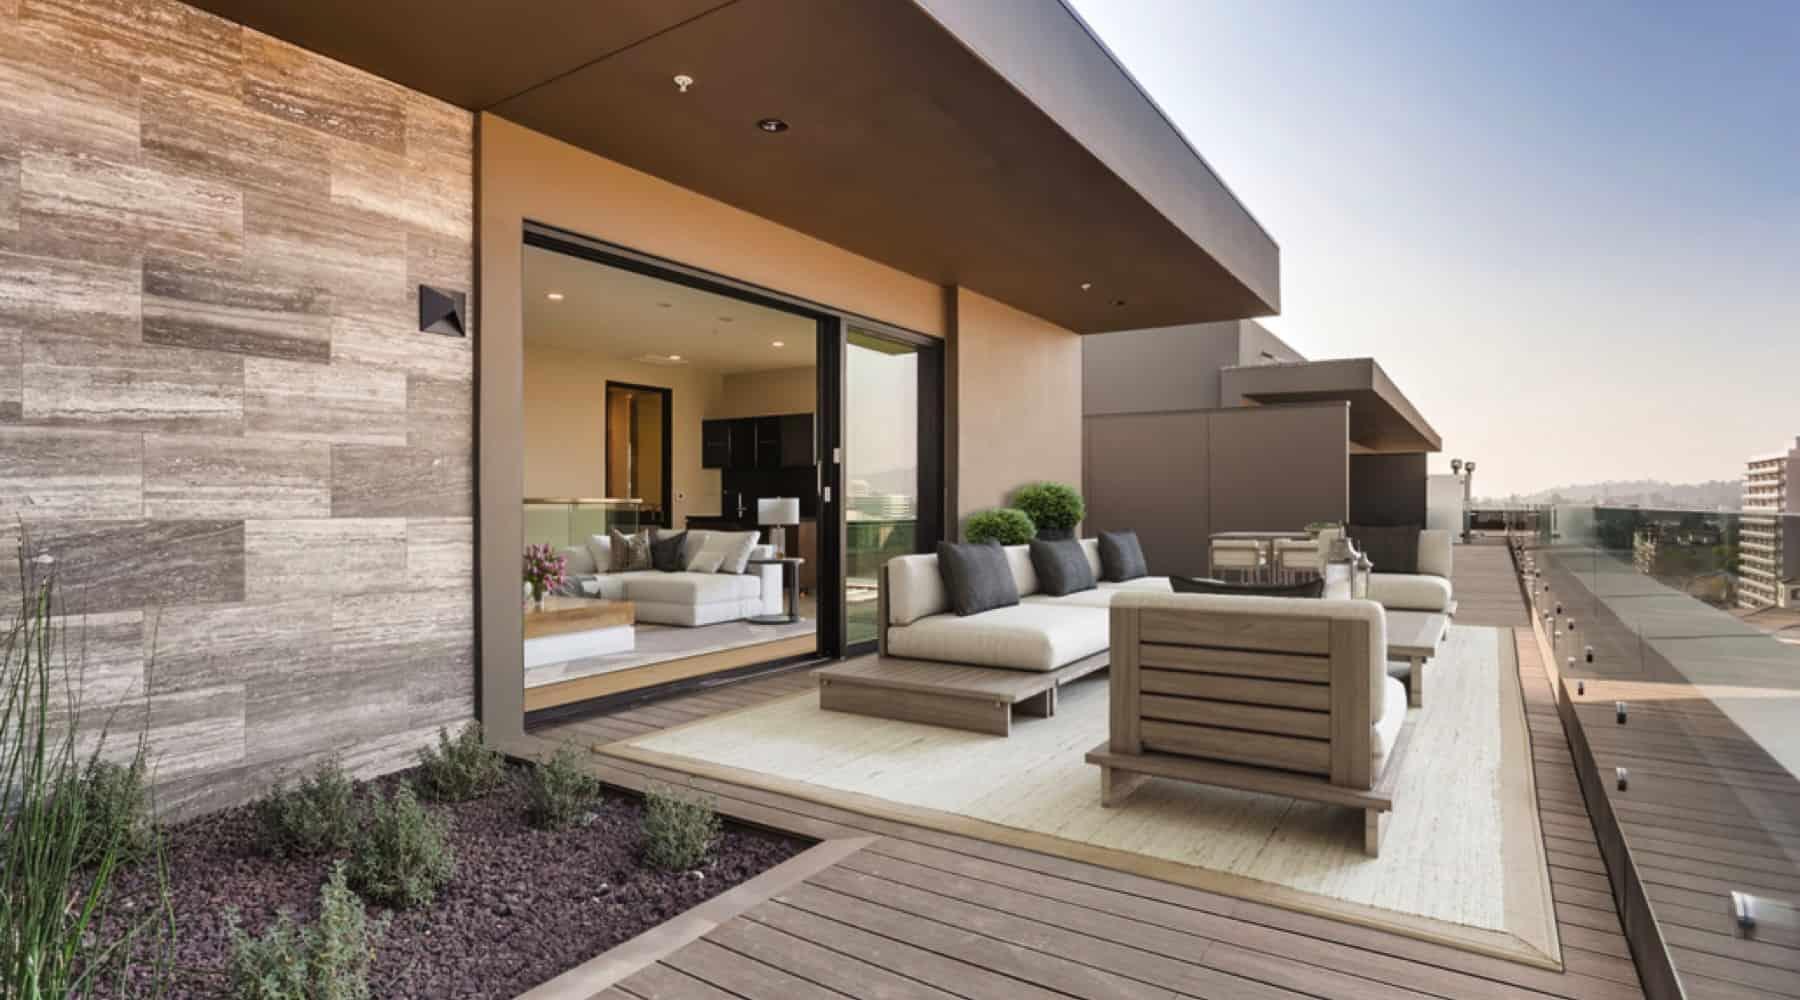 Penthouse_3_Deck